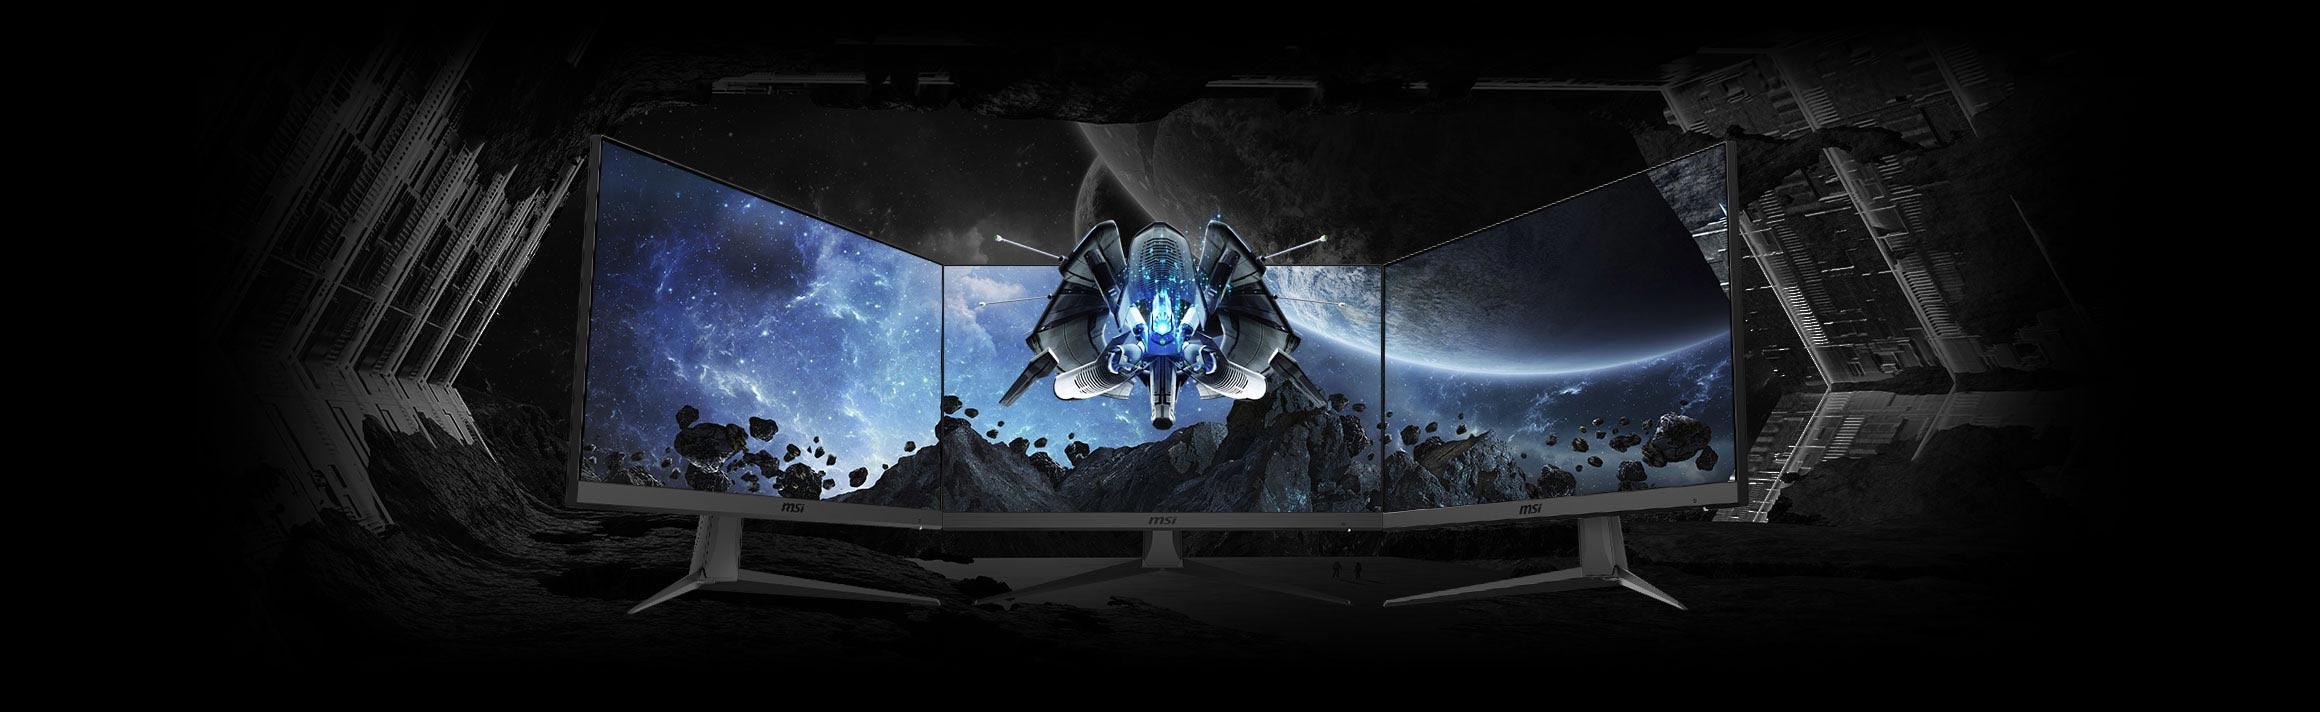 MSI Optix G272 - All About Gaming | Esports Gaming Monitor | MSI